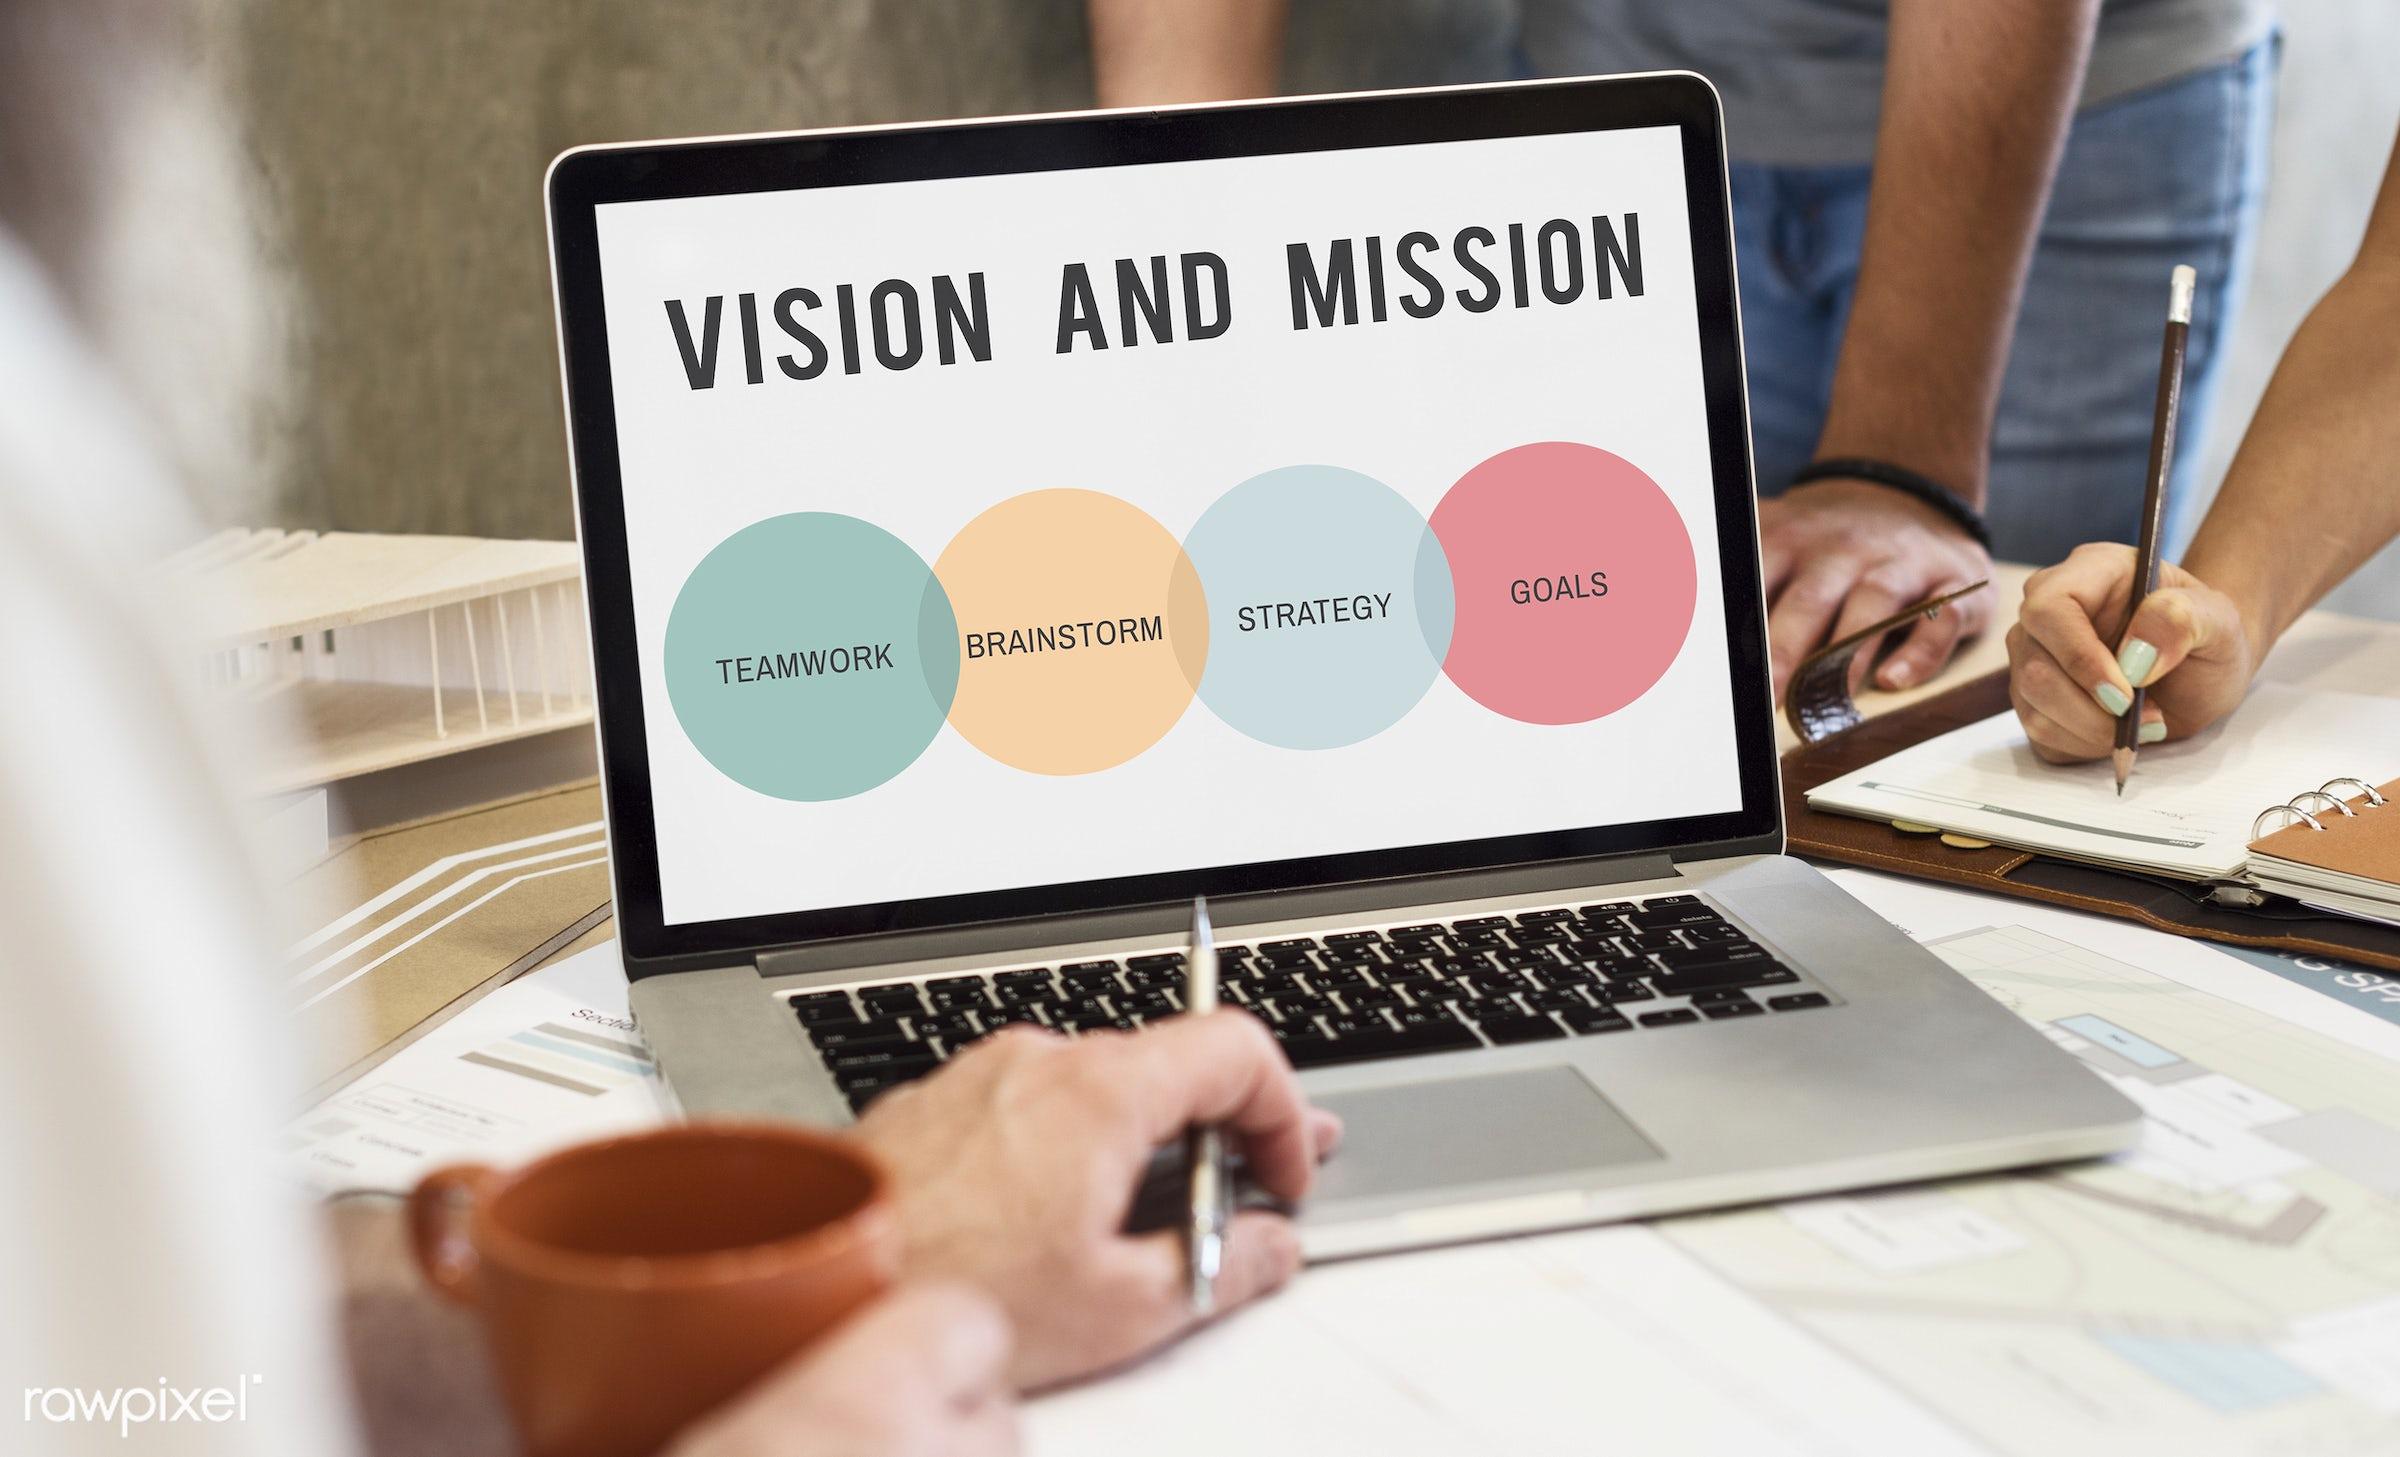 architect, architecture, big business, brainstorm, brainstorming, business, business plan, coffee, coffee cup, commercial,...